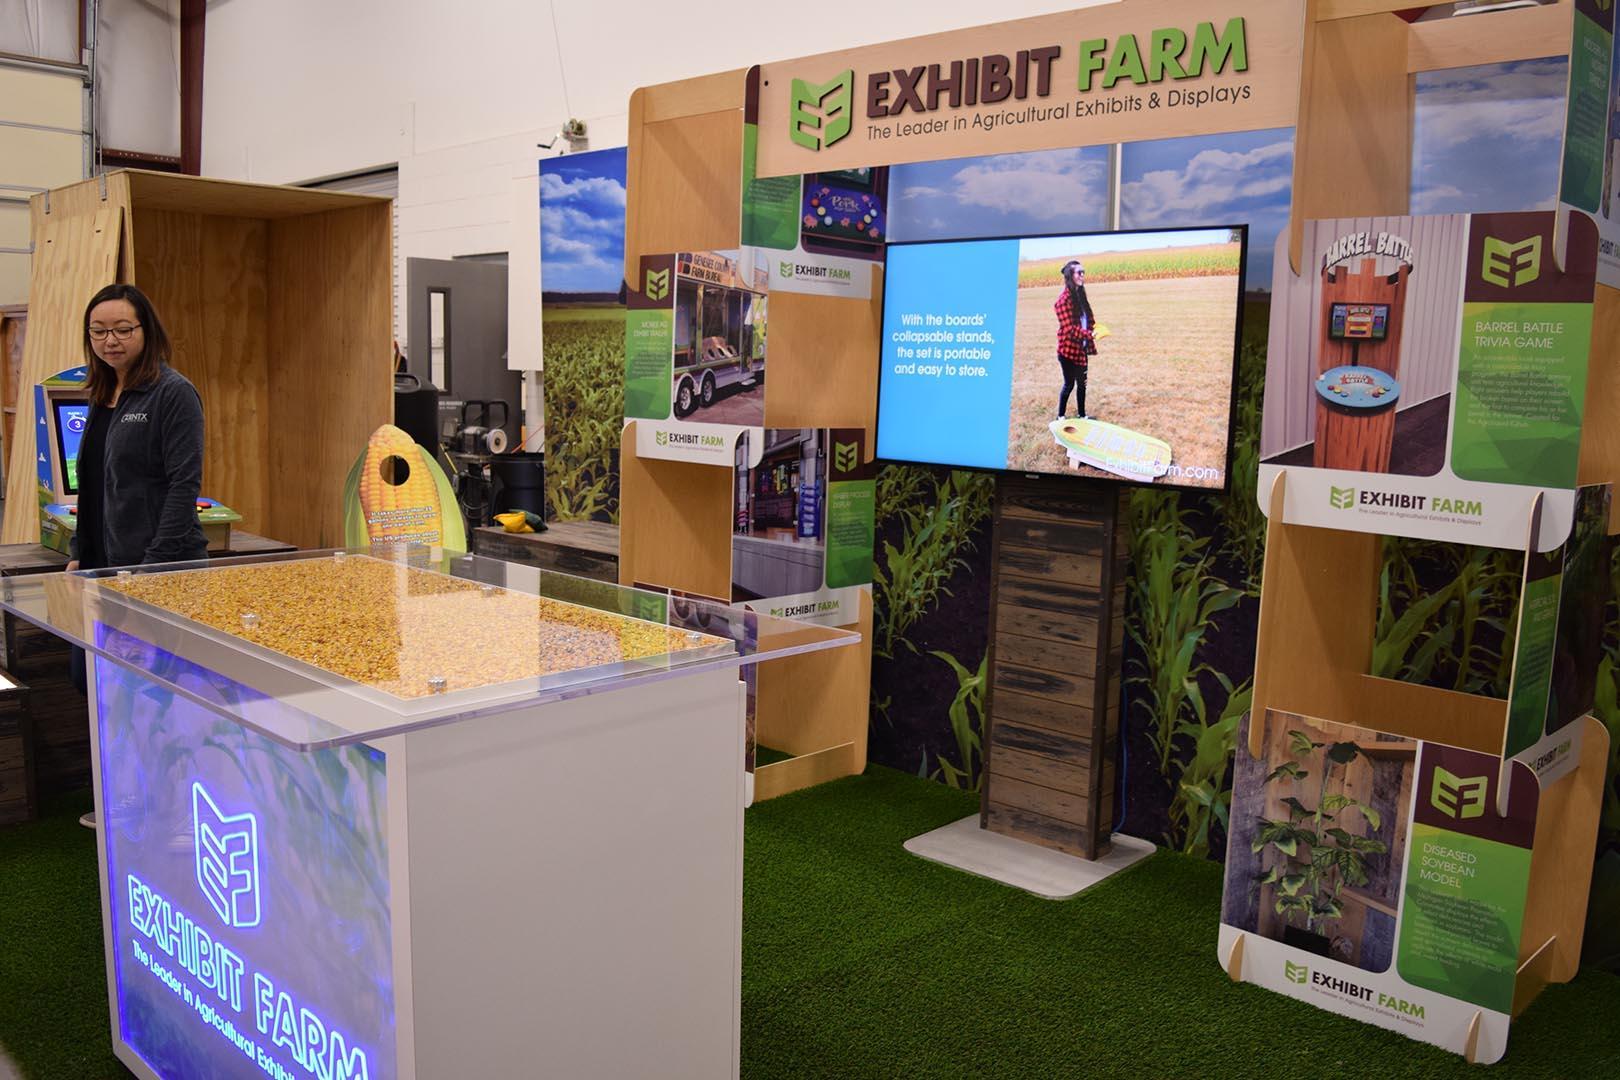 Full Exhibit Farm Booth